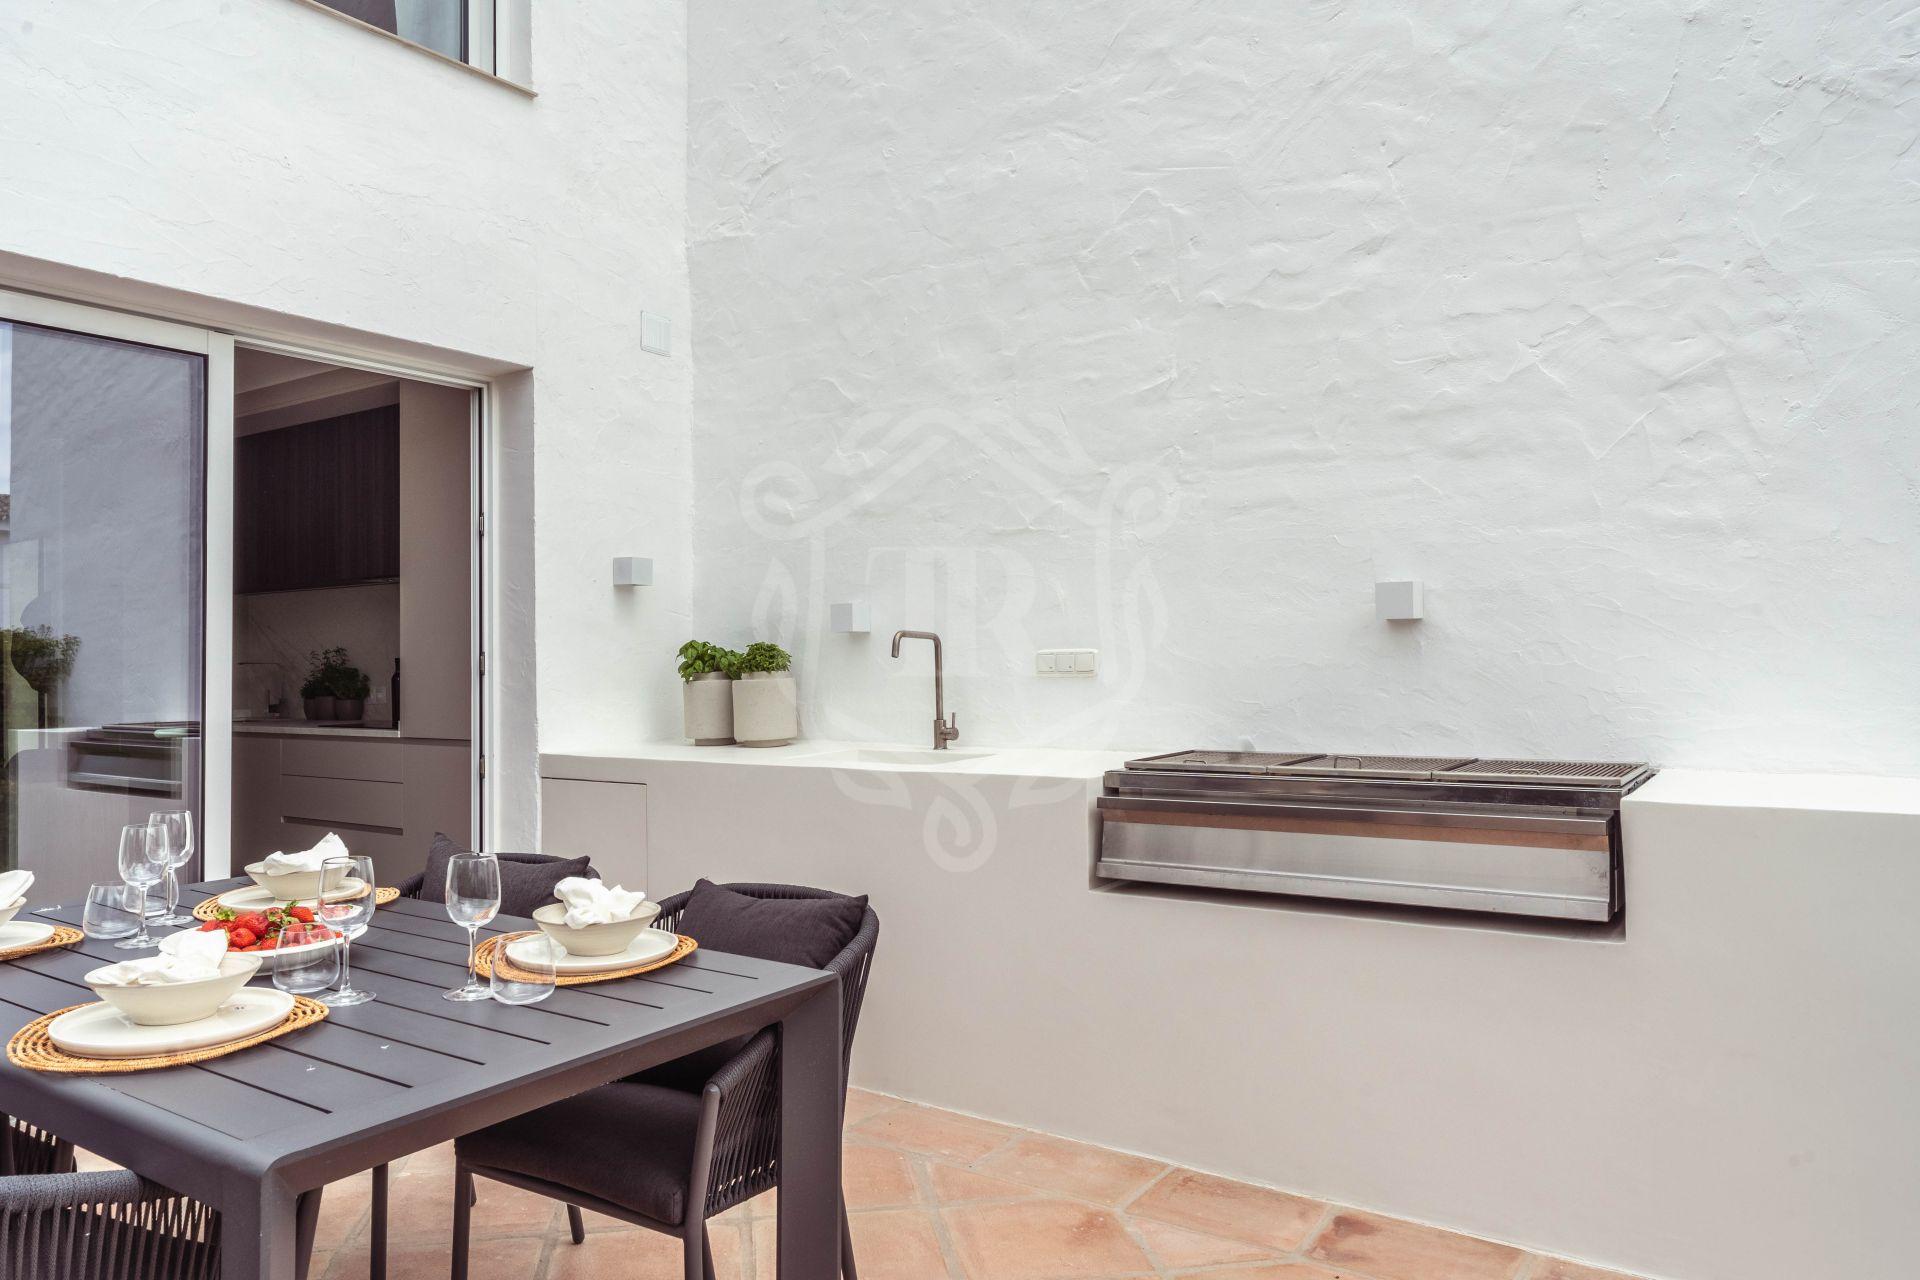 Town House for sale in Las Brisas, Nueva Andalucia